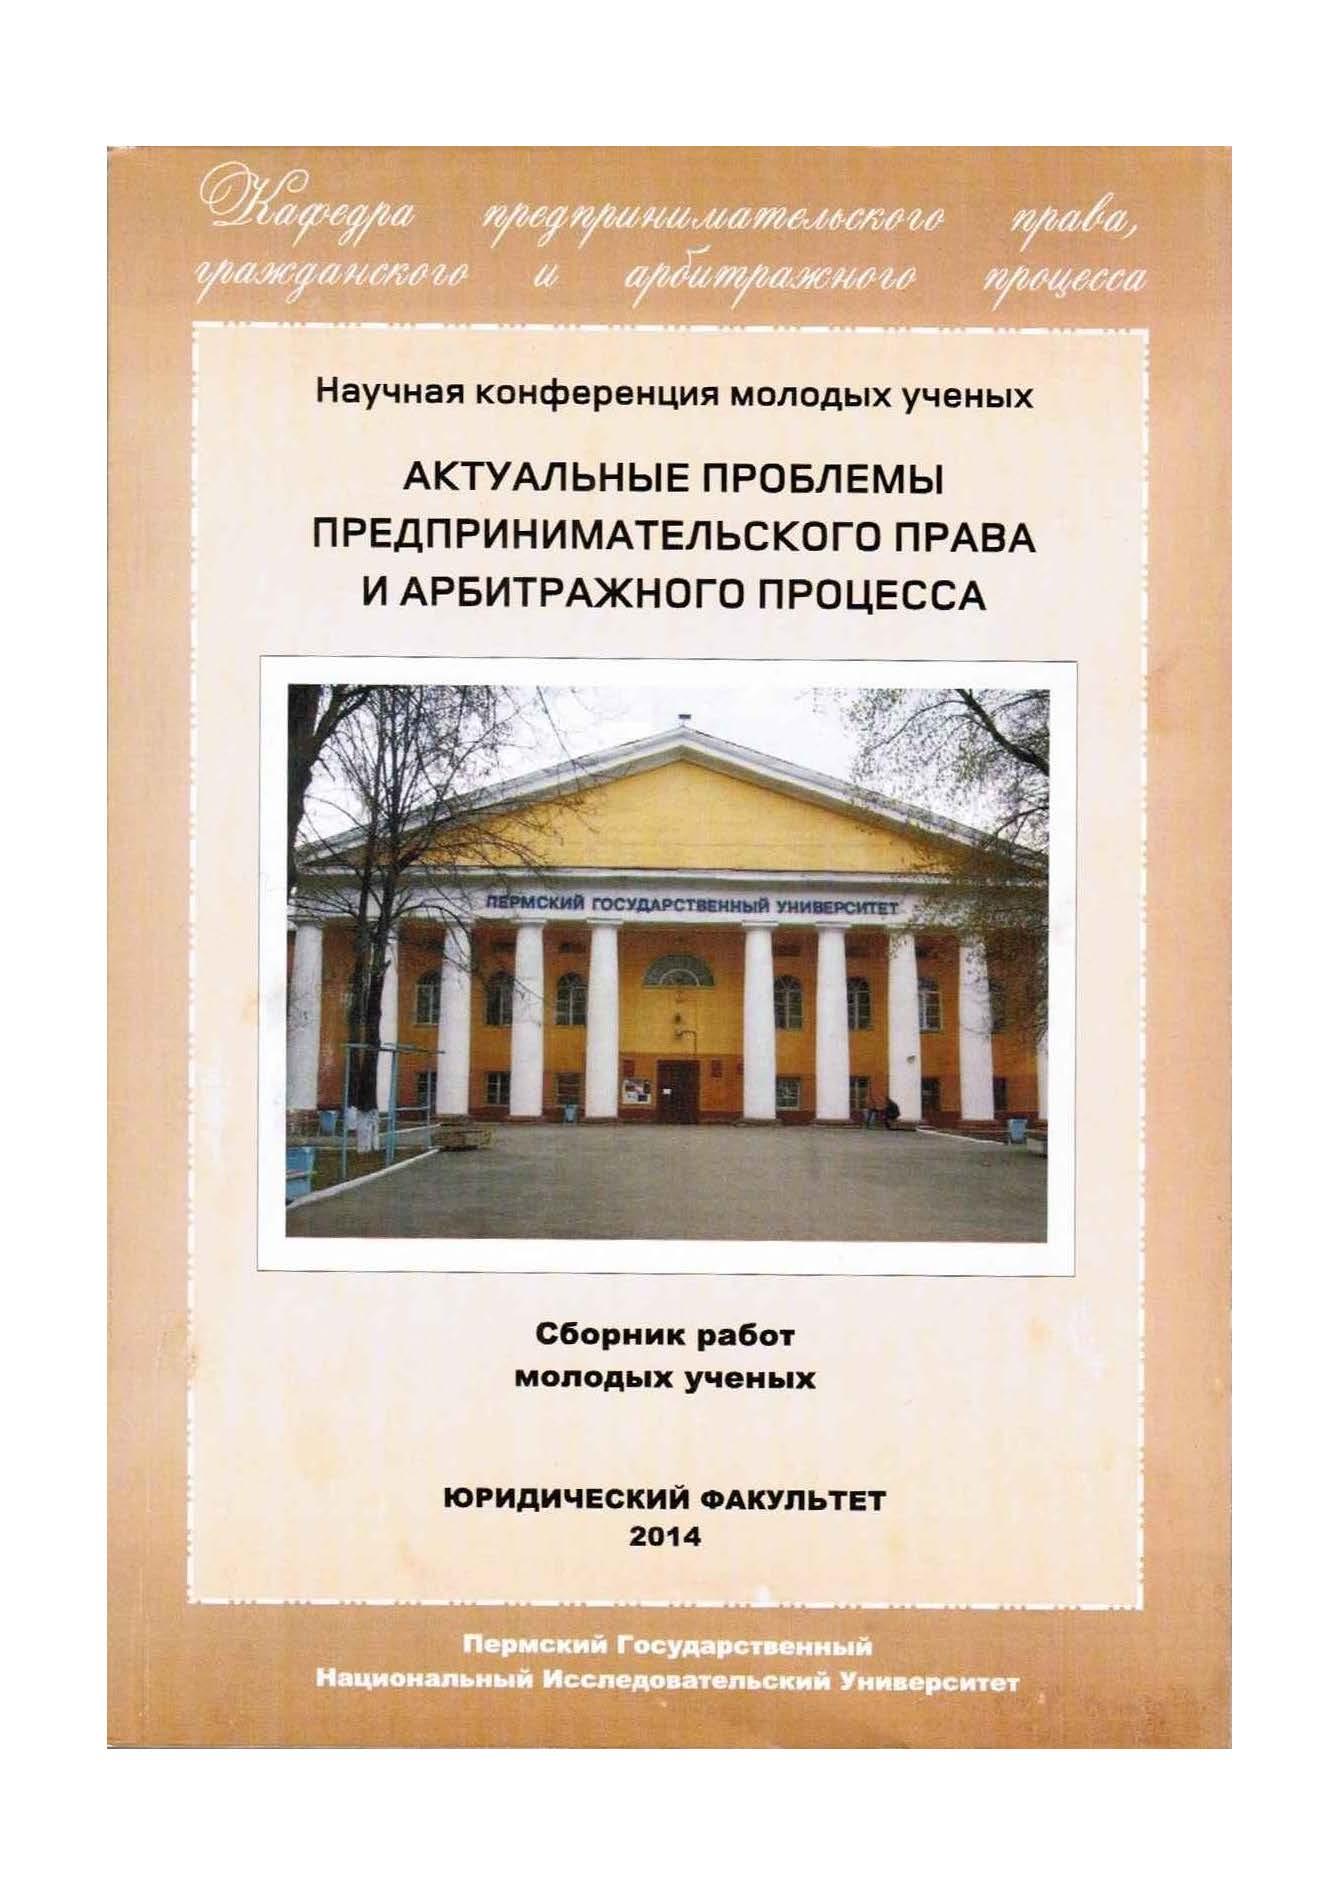 epub the marriage of figaro the opera journeys mini guide series